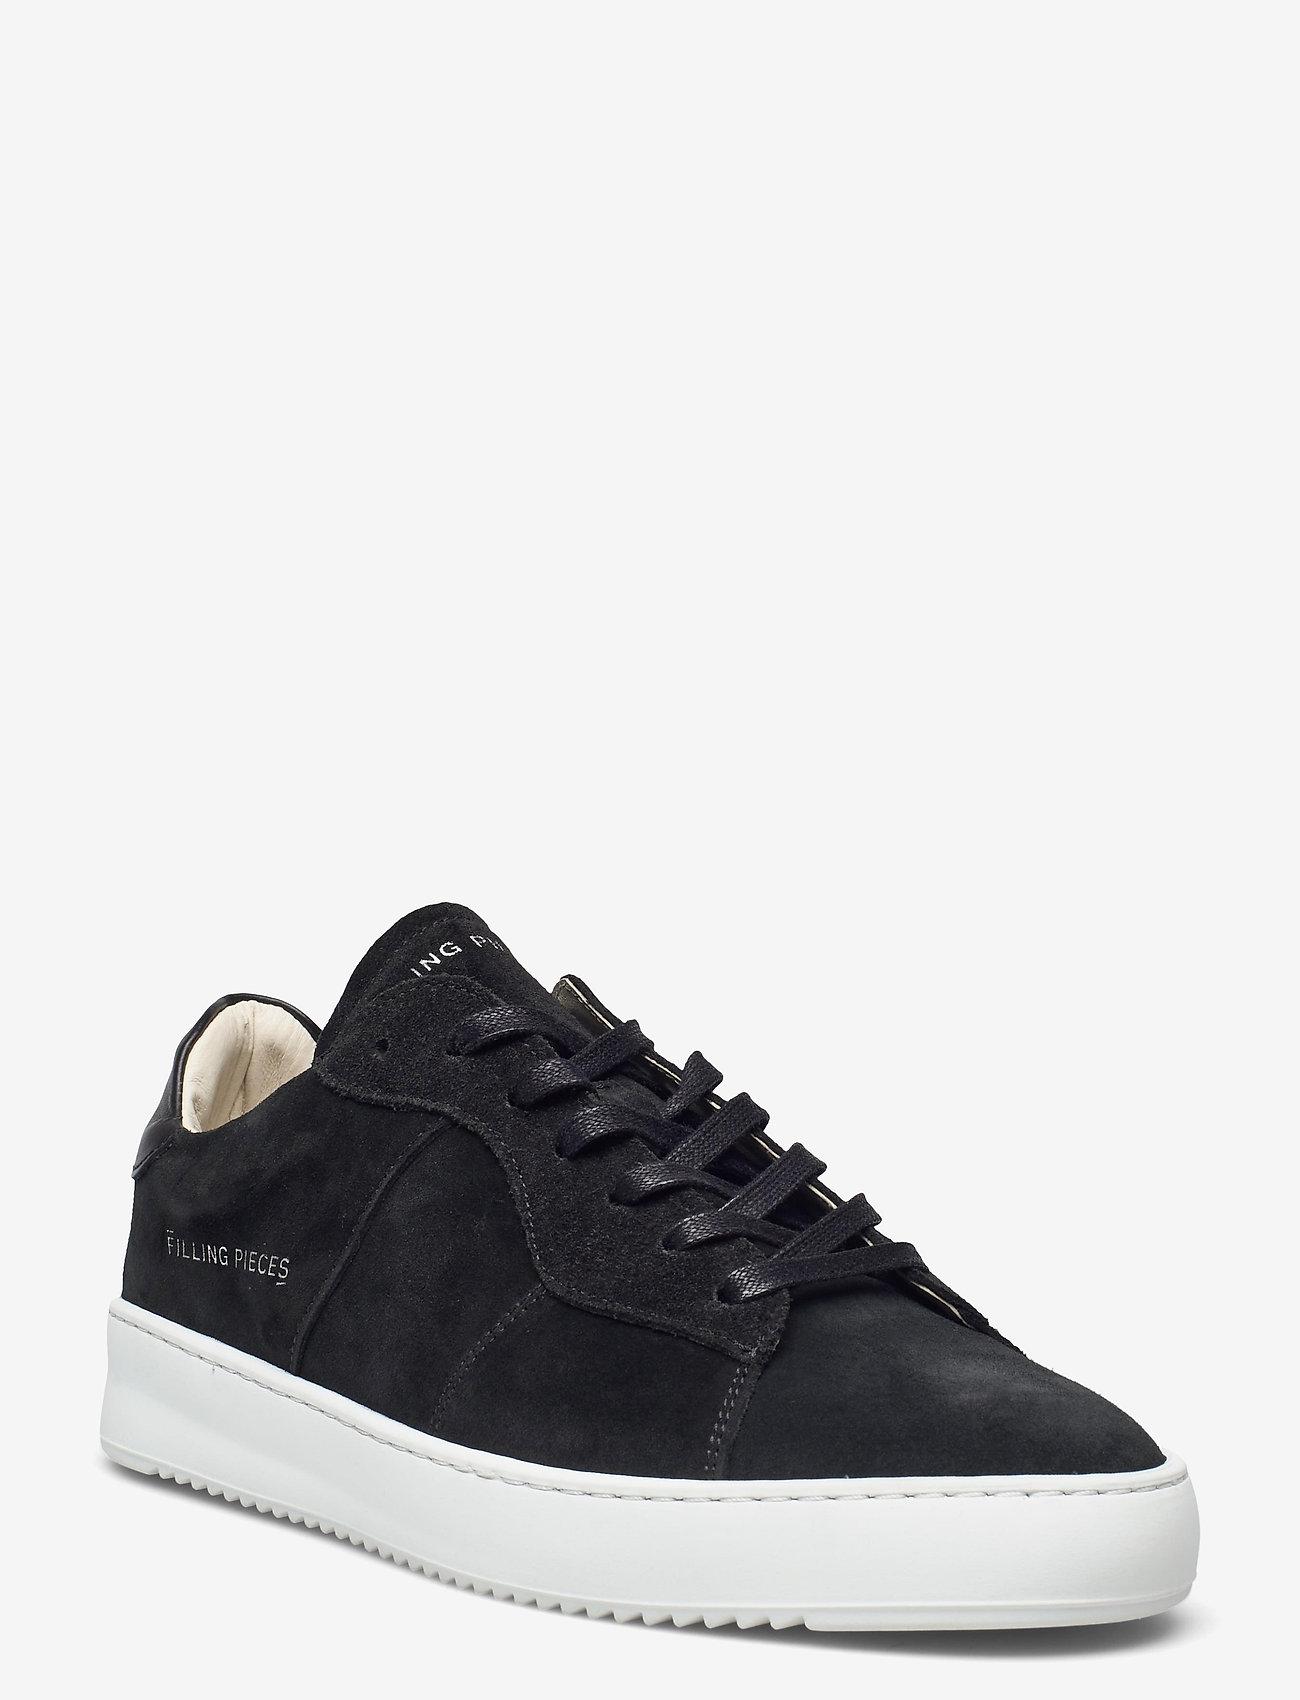 Filling Pieces - Court Ripple Suede - låga sneakers - black - 0